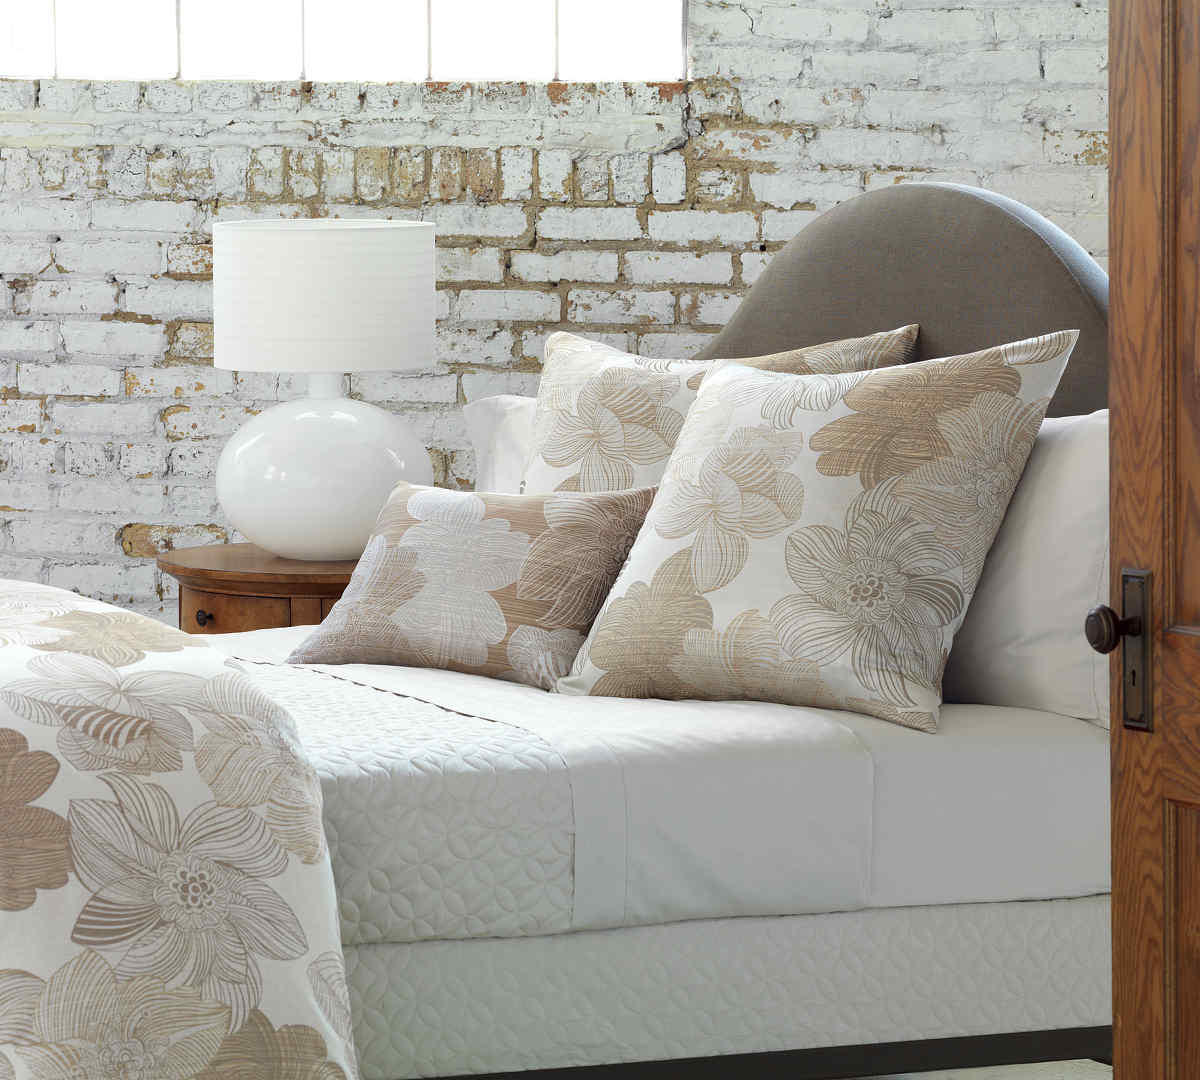 sleep hygiene tips to optimize sleep natural sleep naturopath edmonton